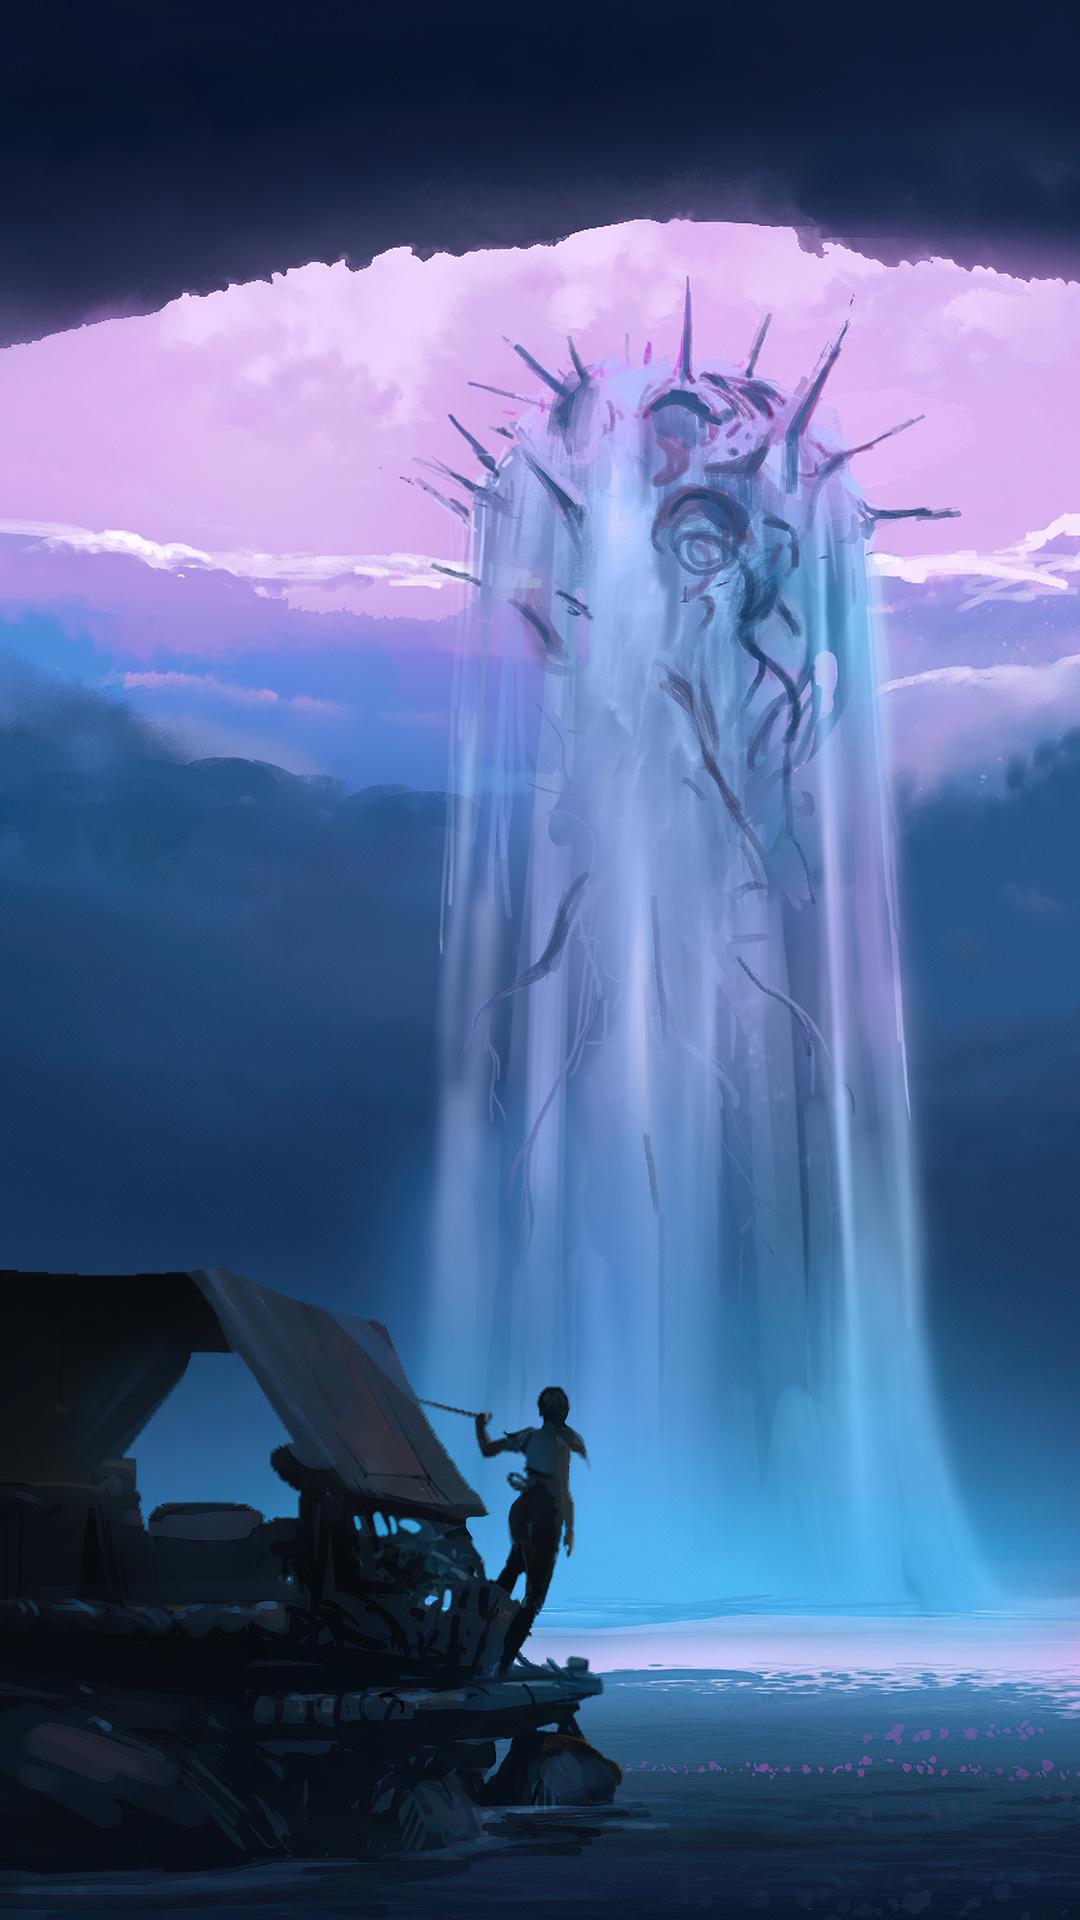 twilight-waterfall-5k-ej.jpg